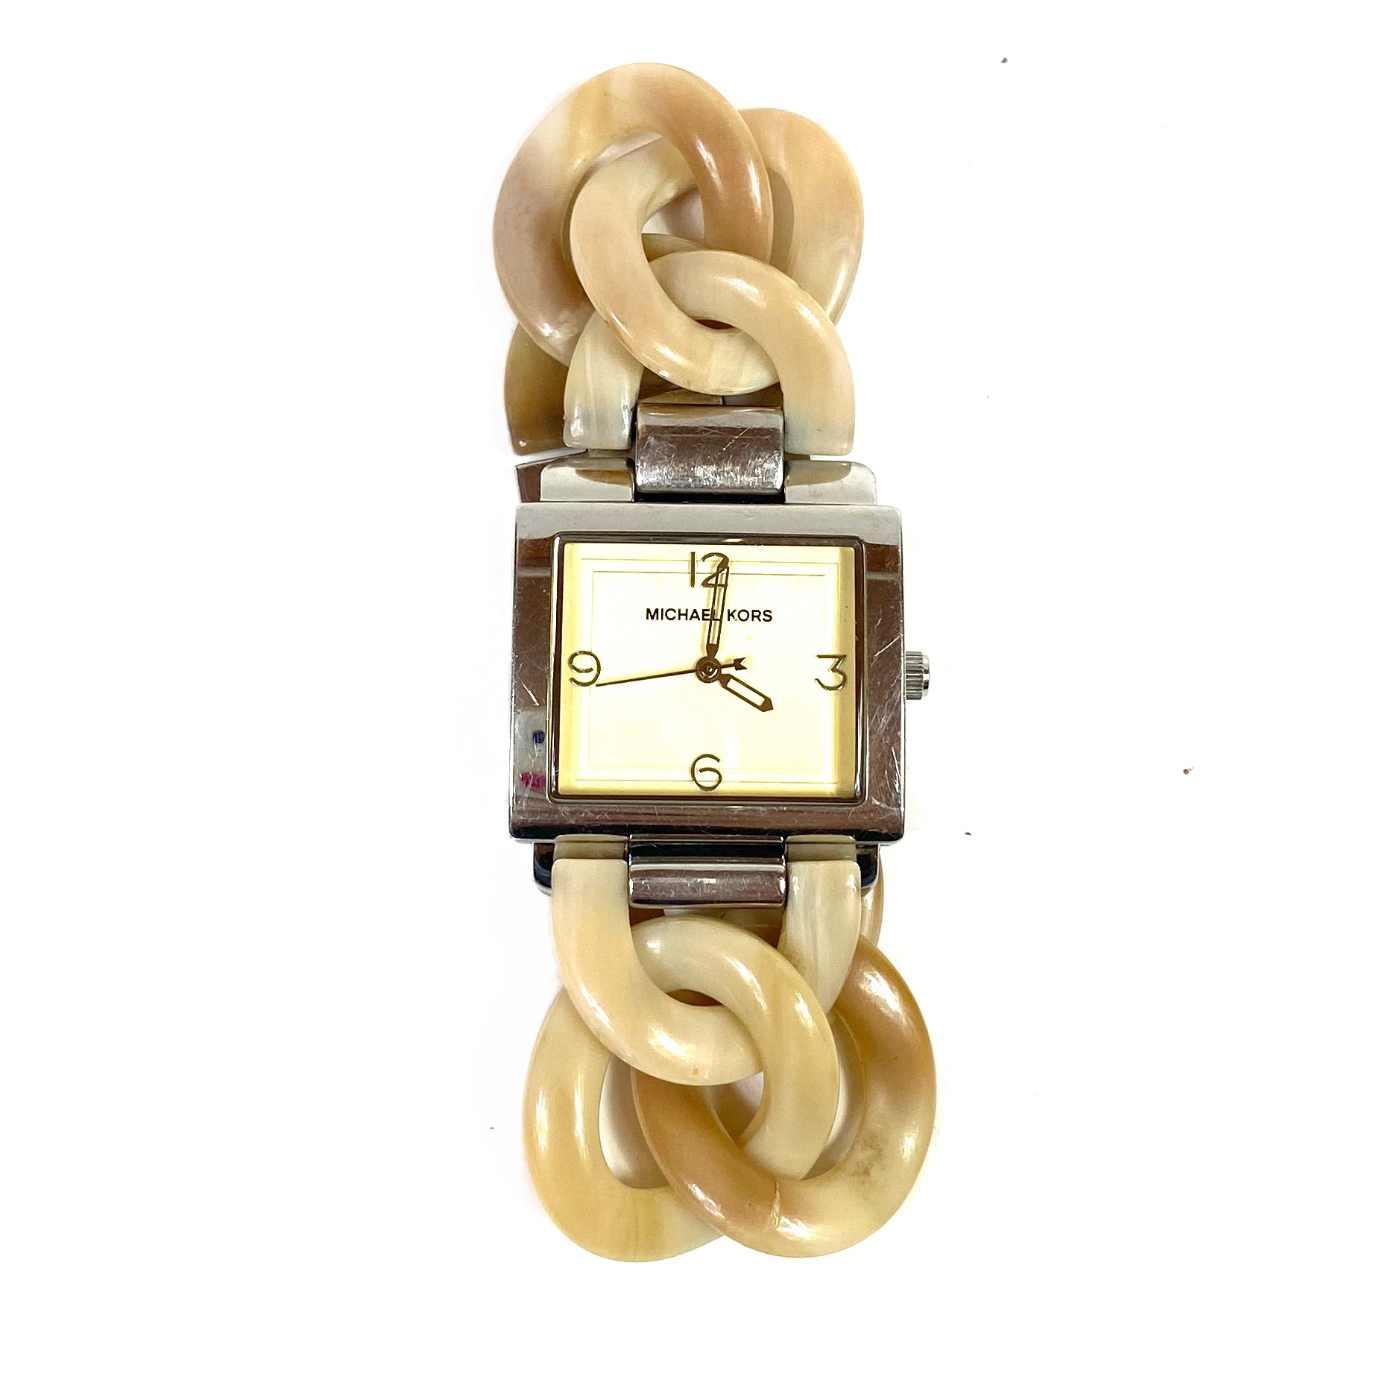 Relógio Michael Kors Elos MK 4108